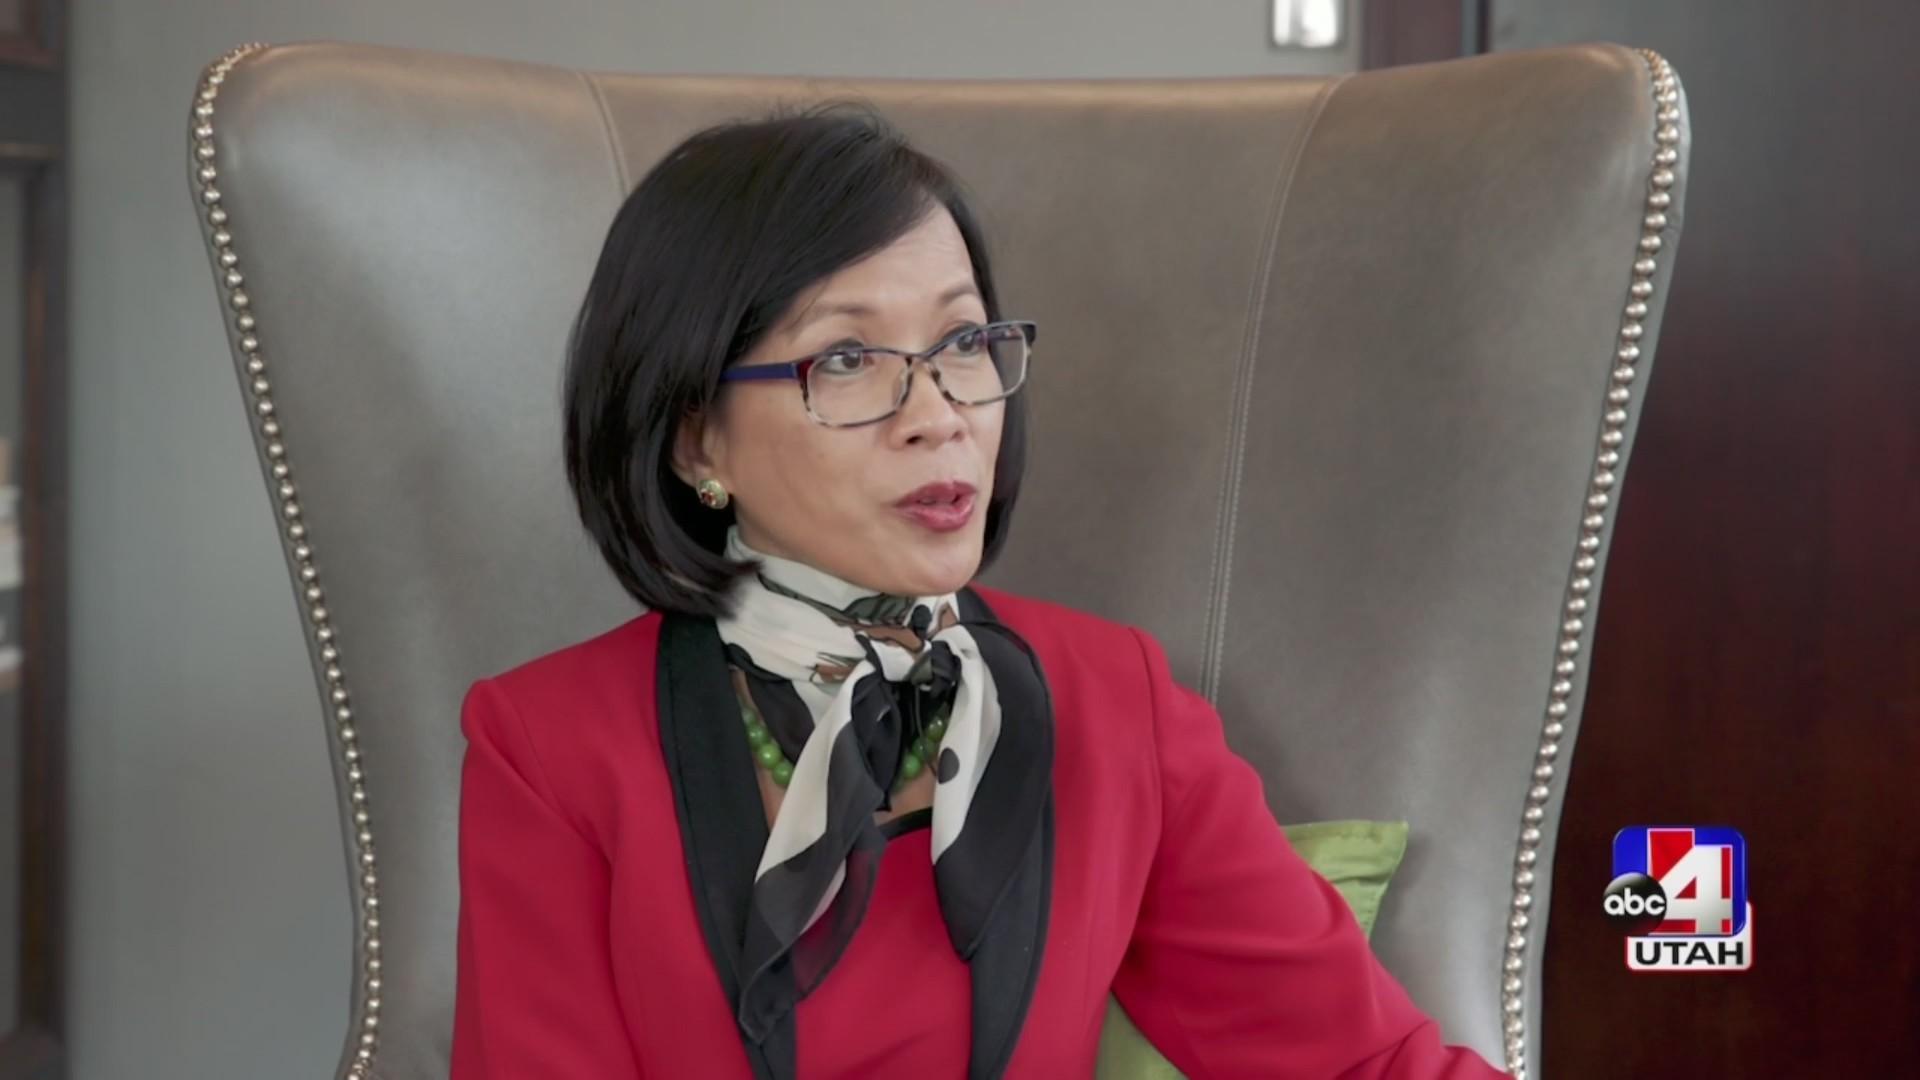 Celebrating Woman: UVU's first female president Dr. Astrid S. Tuminez